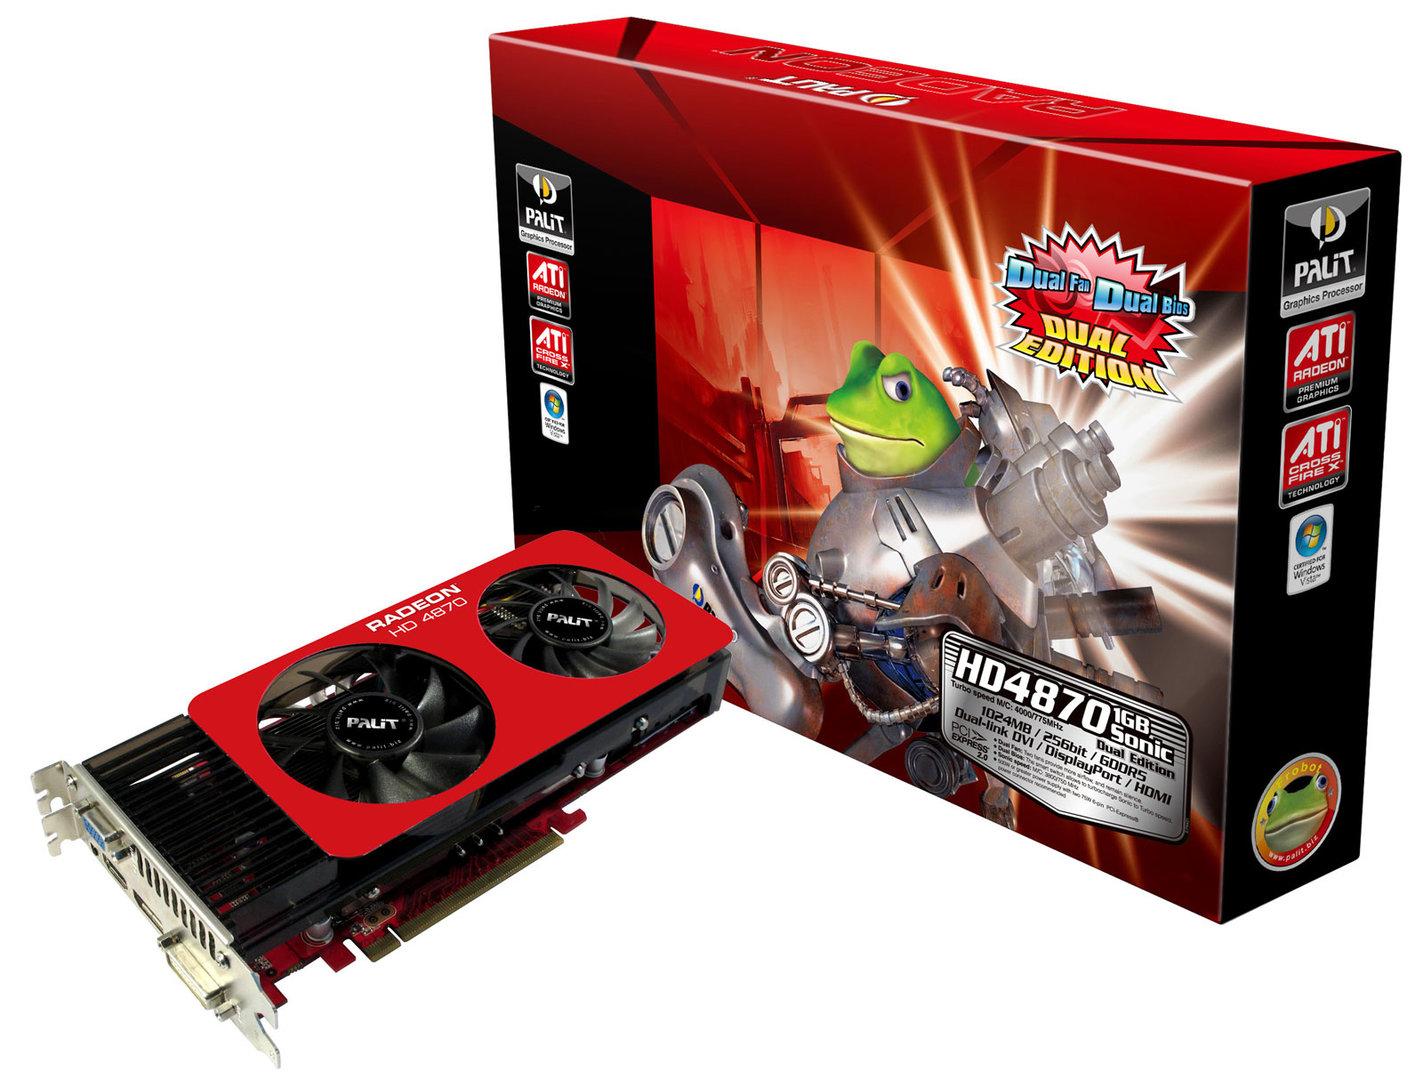 Palit Radeon HD 4870 1GB Sonic Dual Edition